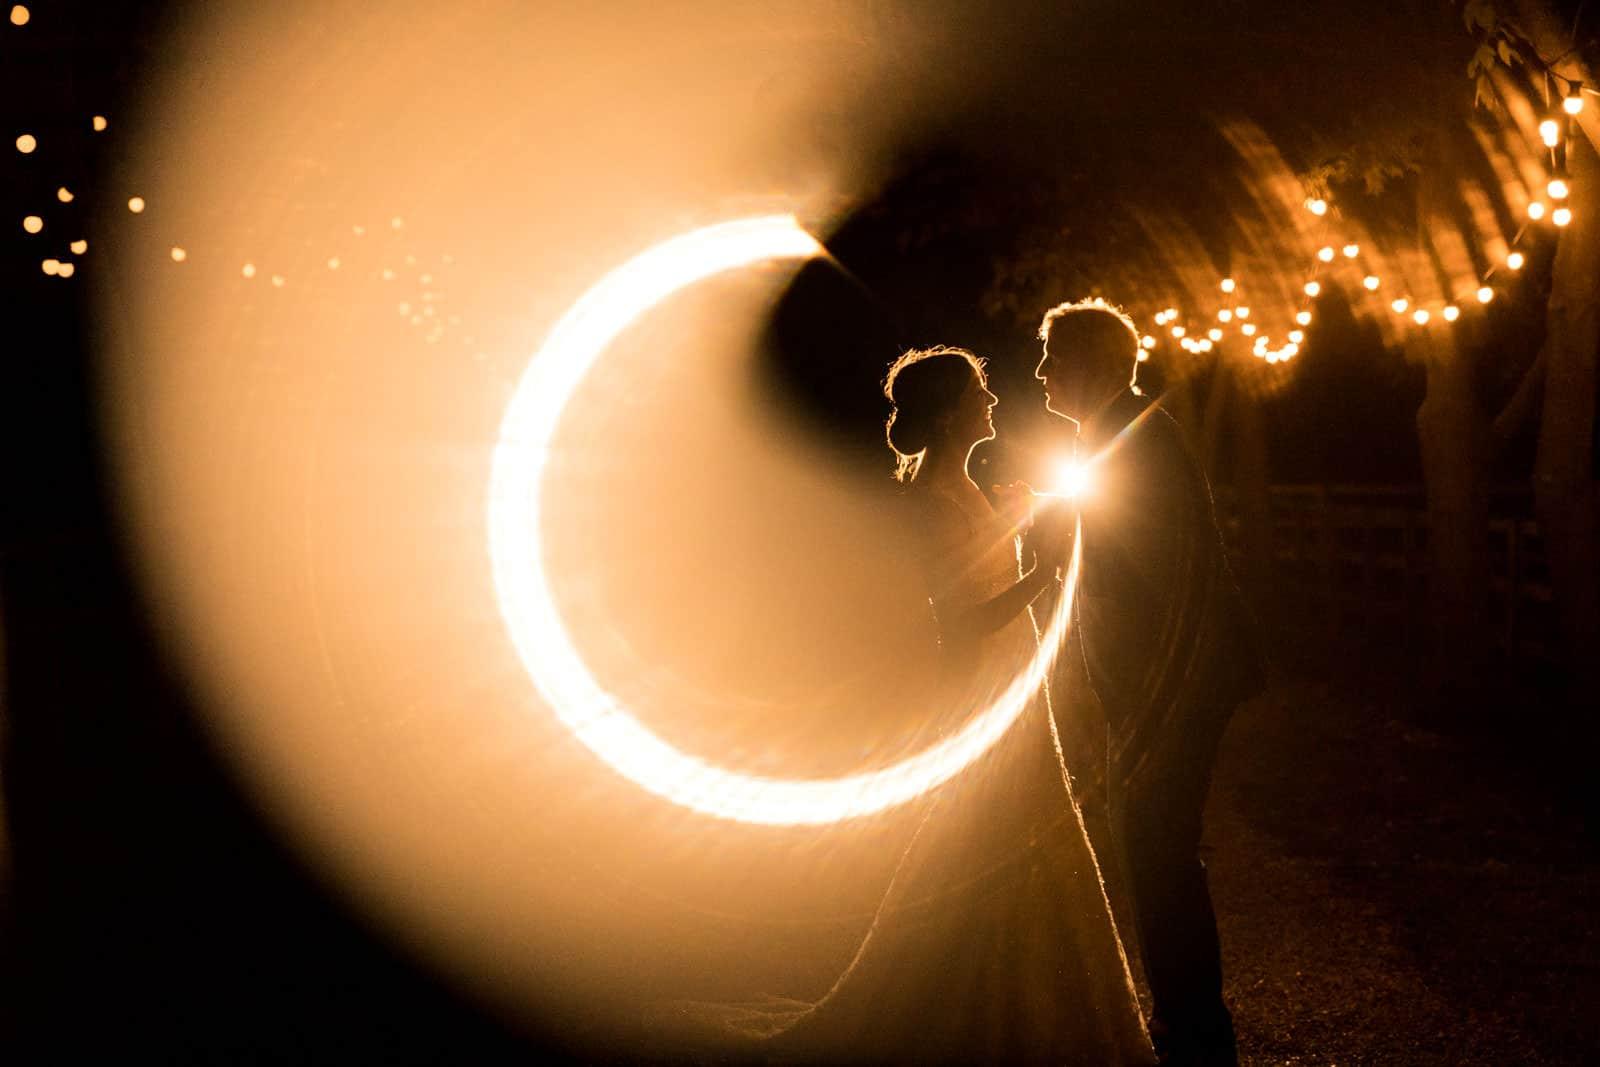 Woodfarm entrance lights used to illuminate couple at night